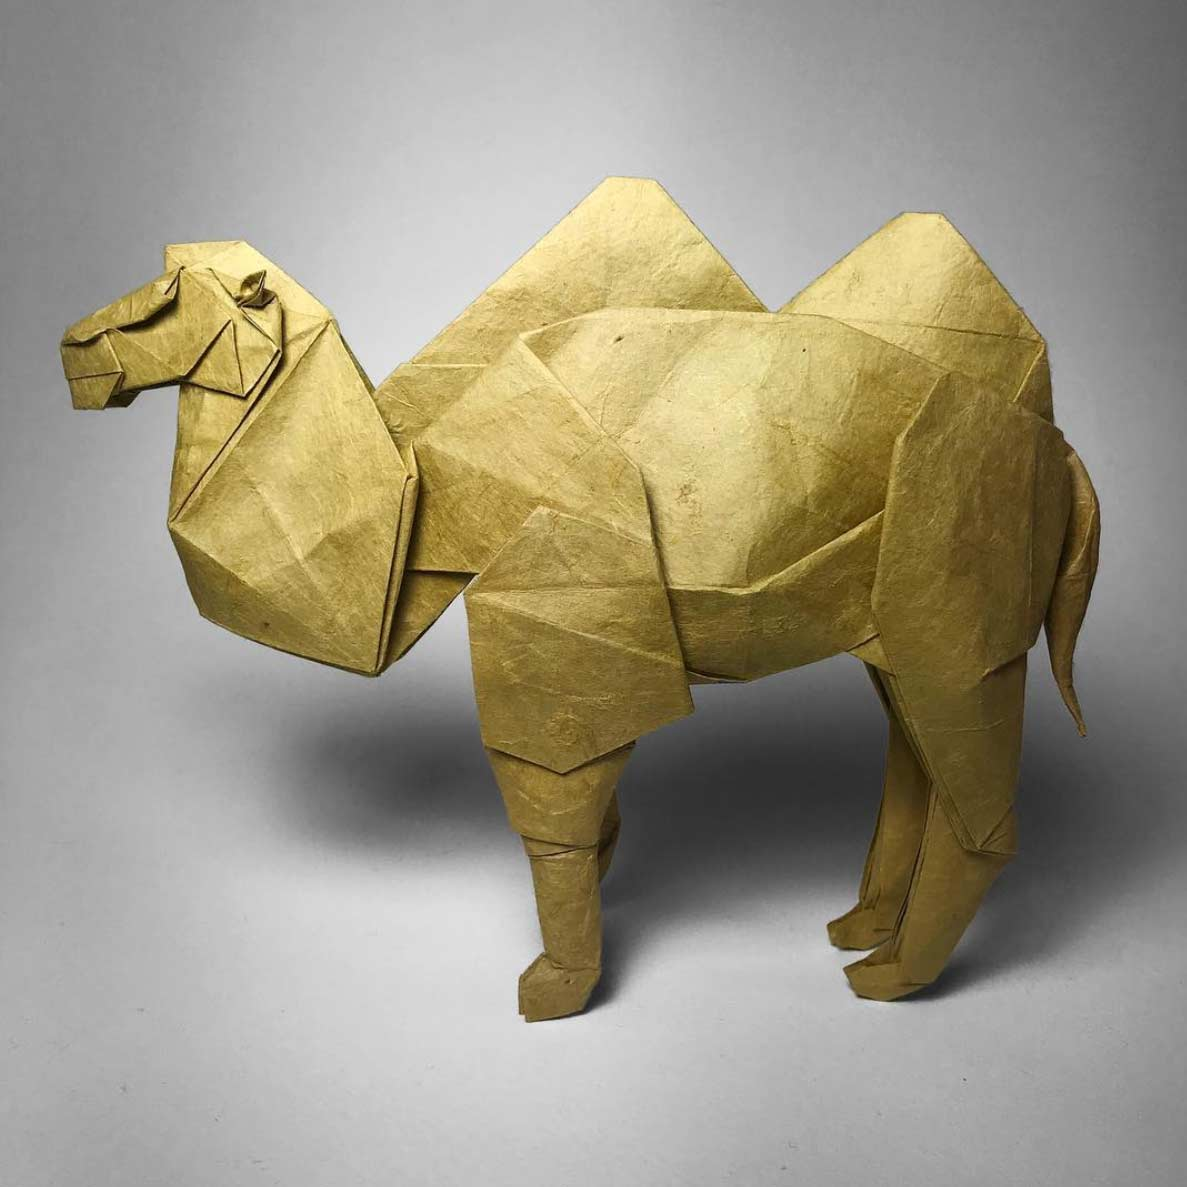 Geniale Origami-Kunstwerke von Robby Kraft Robby-Kraft-Origami_12